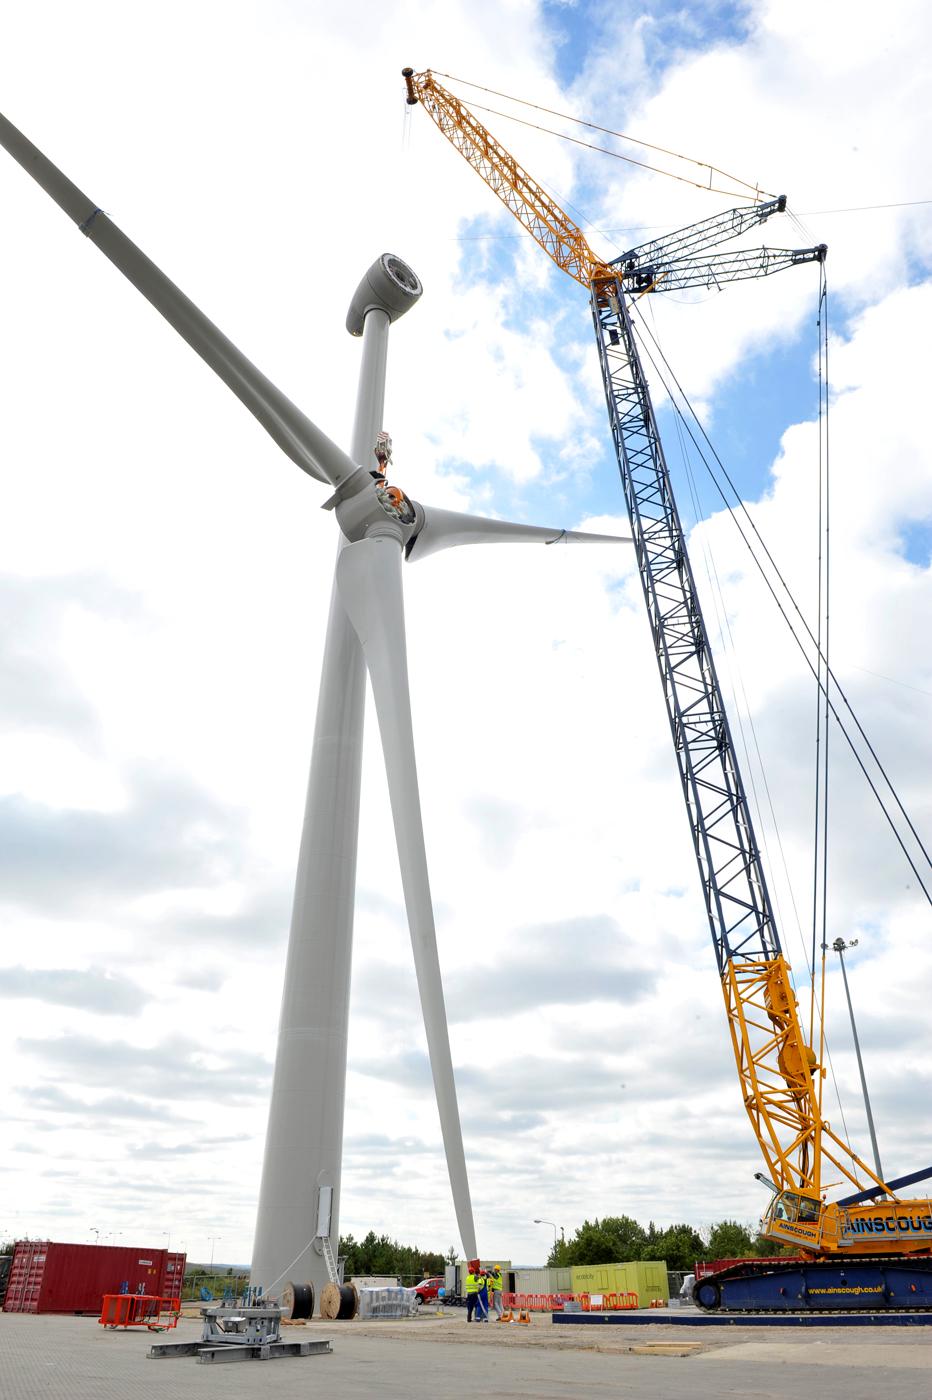 Ford S Third Wind Turbine In Dagenham Provides Green Power Autoevolution